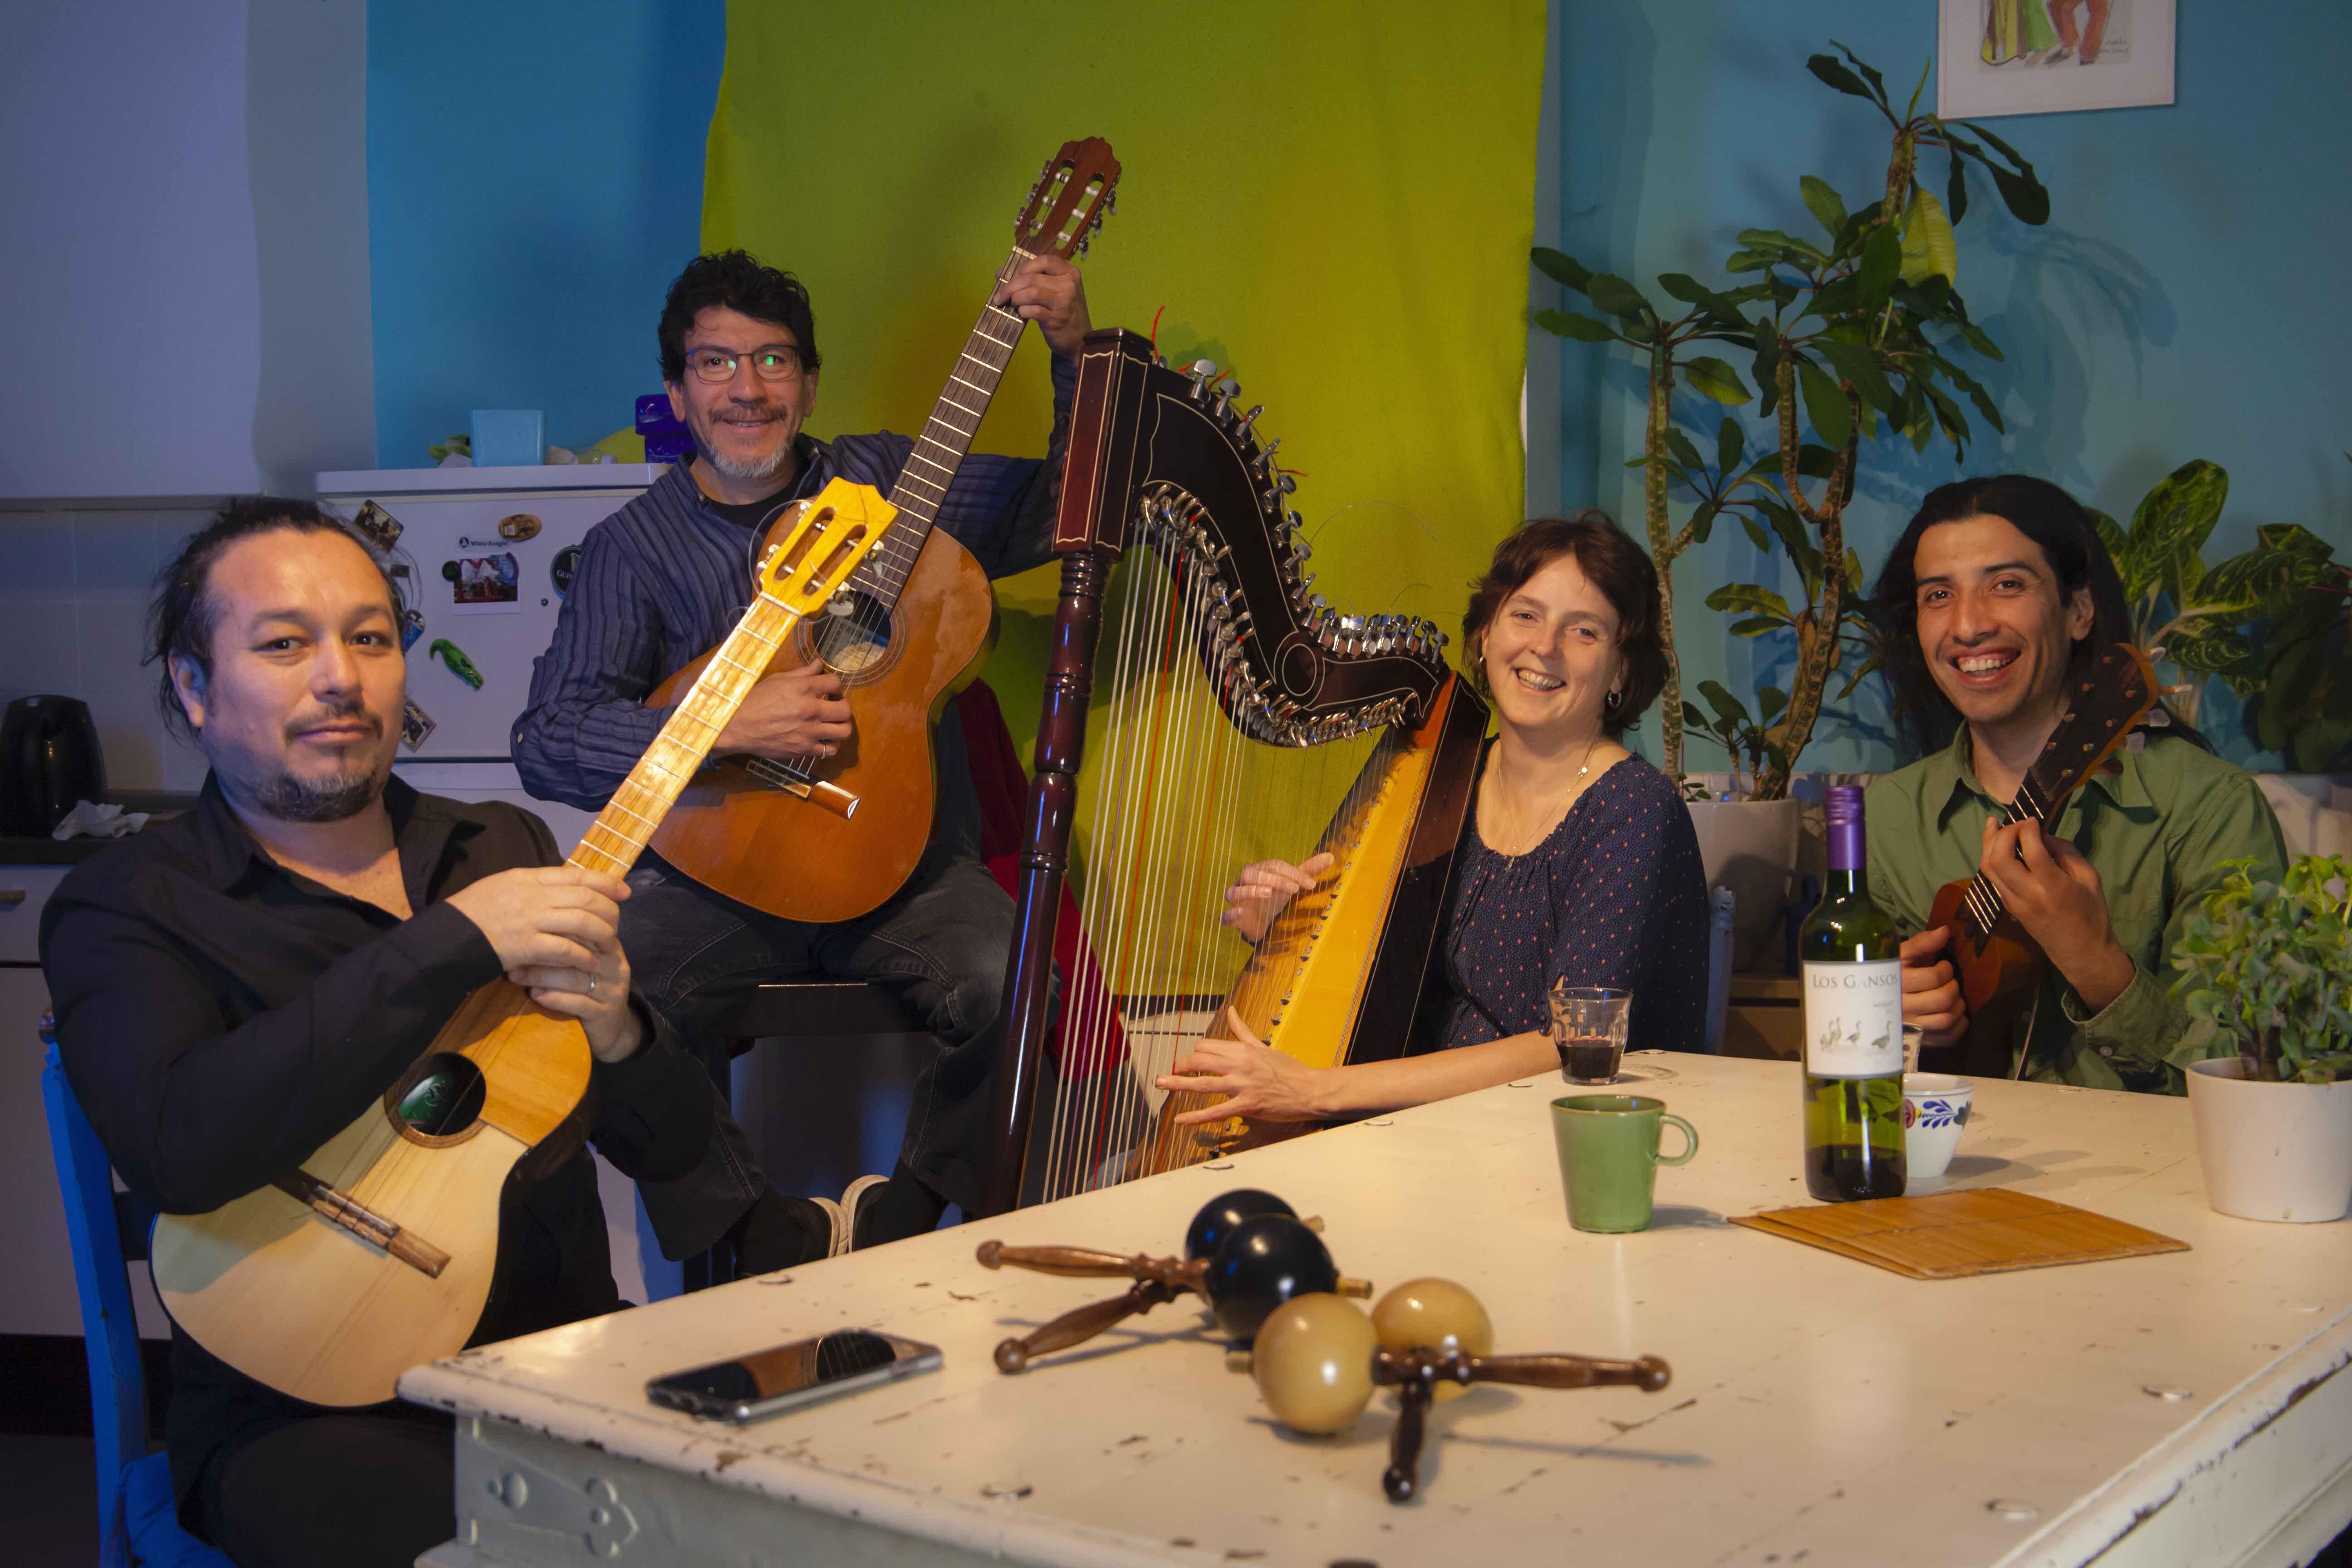 Wereldse Klanken: Kwartet Arrayán, Latijns Amerikaanse swingende harpmuziek